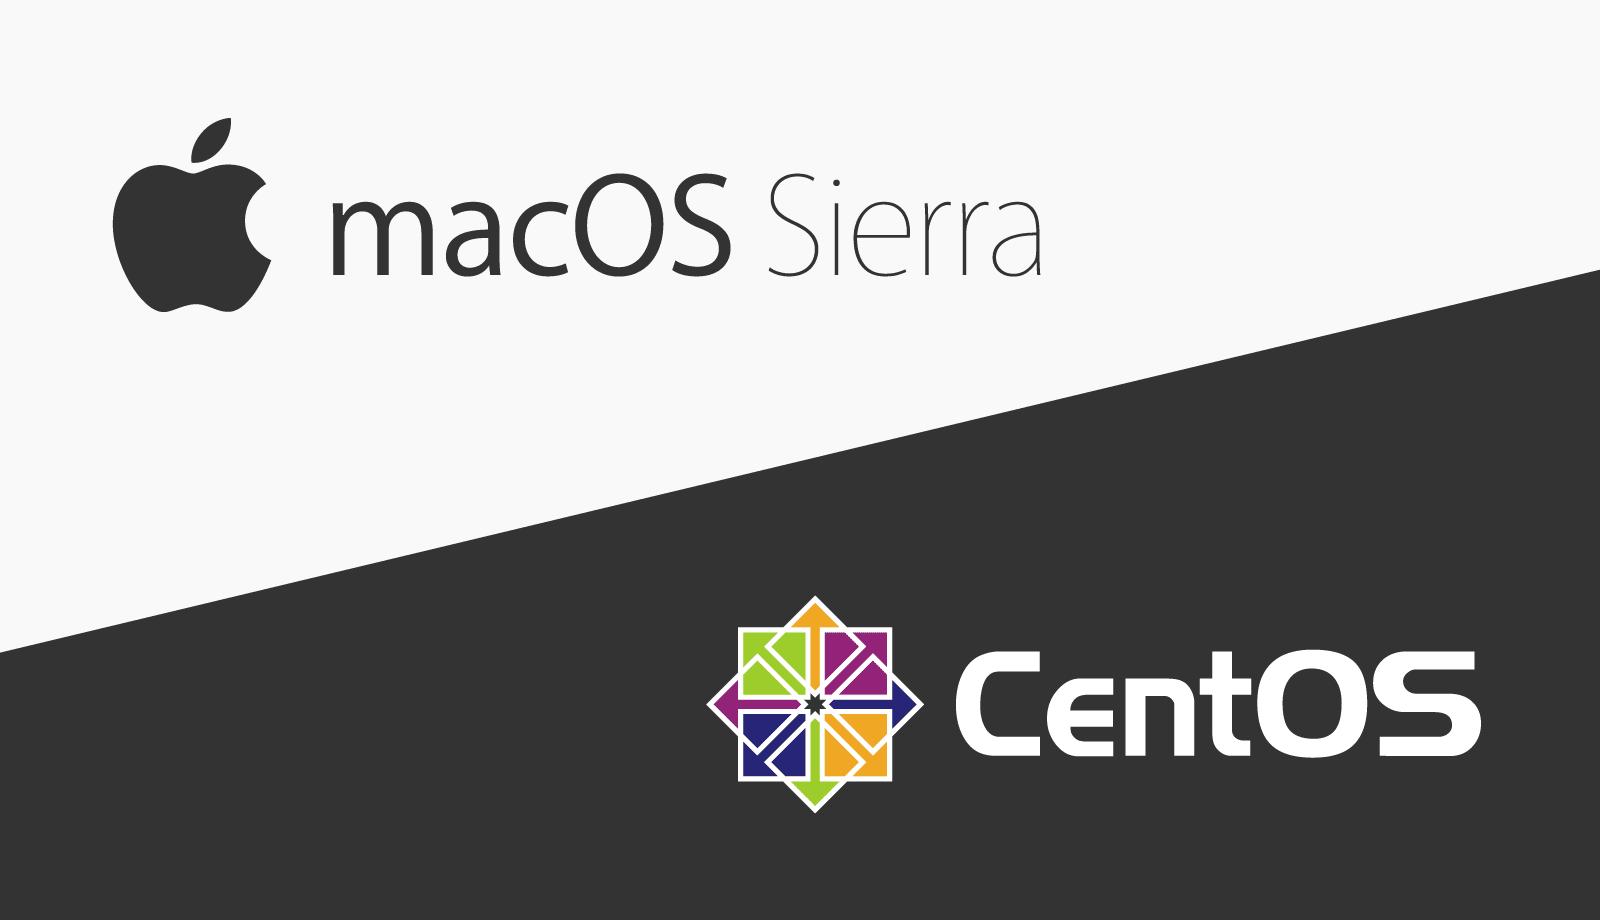 mac OS High SierraにVirtualBox+VagrantでCentOS7仮想環境を構築【#2】 ~ Apacheでwebサーバー立ち上げまで ~